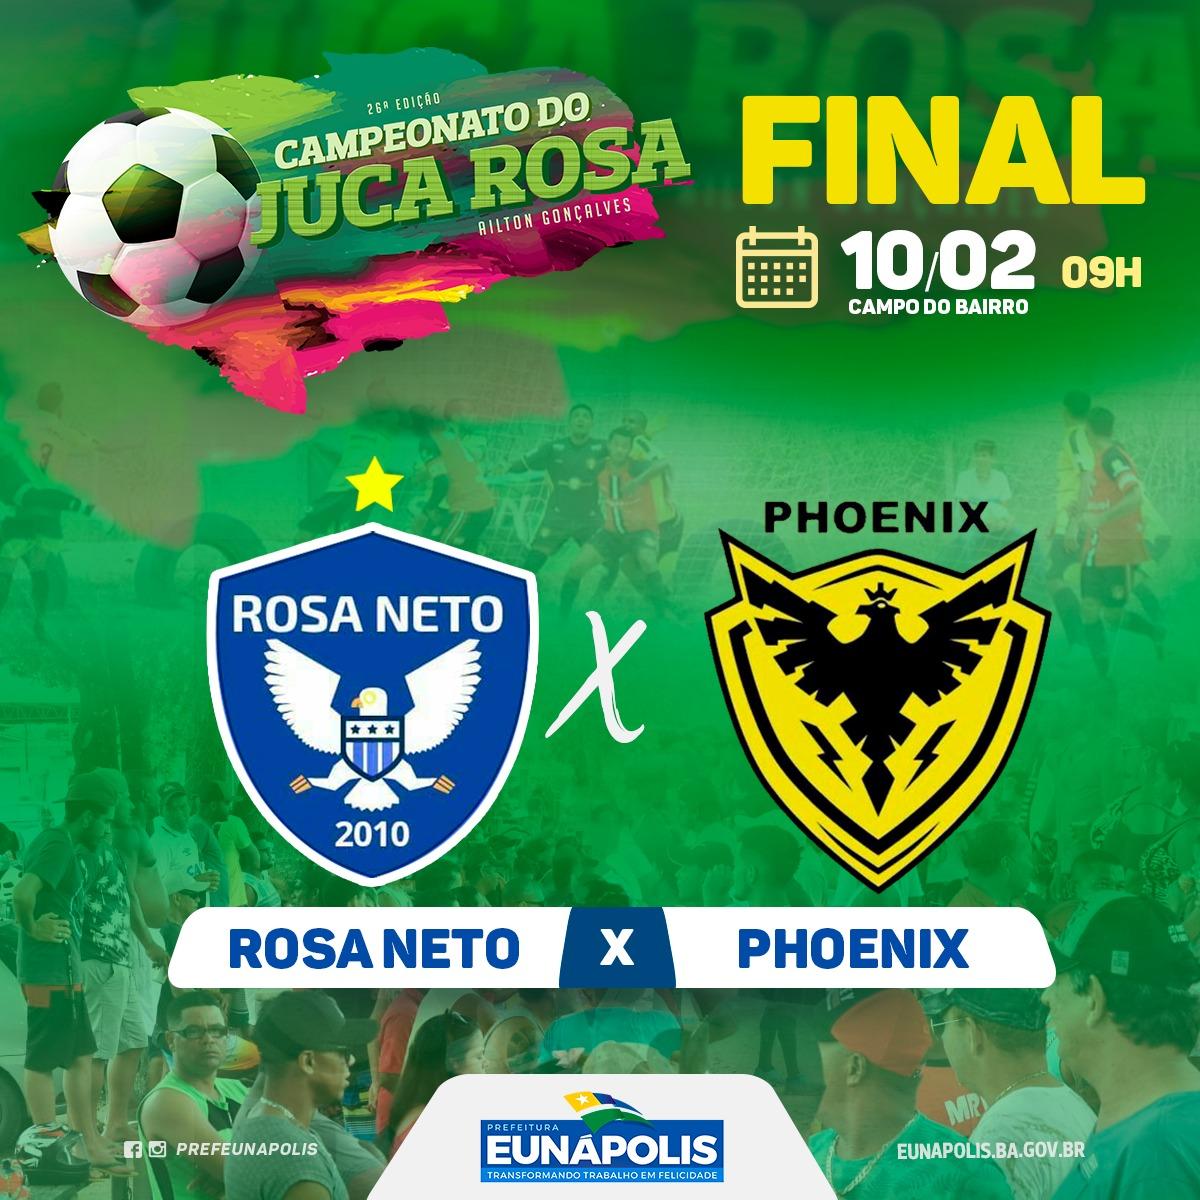 a101dc0b14 FUTEBOL – Rosa Neto e Phoenix prometem final eletrizante neste domingo (10 02)  no Juca Rosa